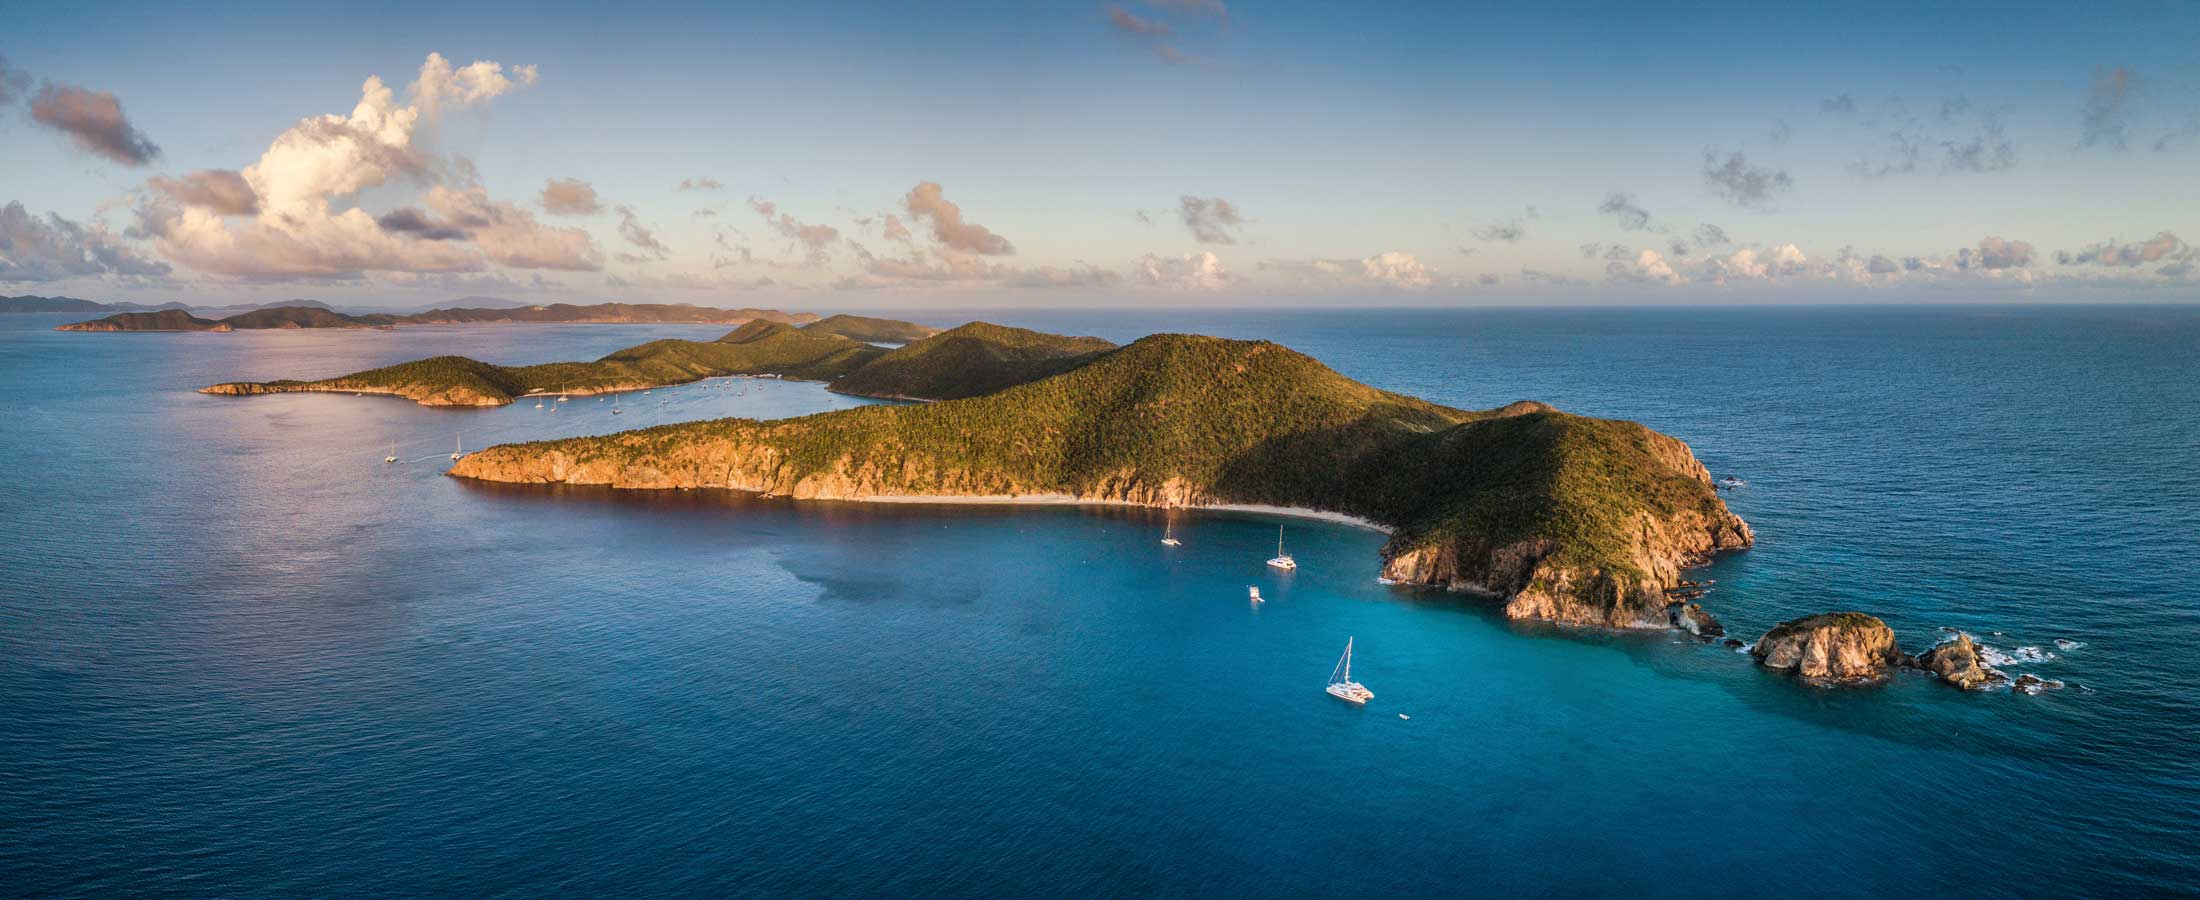 Caribbean British Virgin Islands (BVI) Yacht Charters